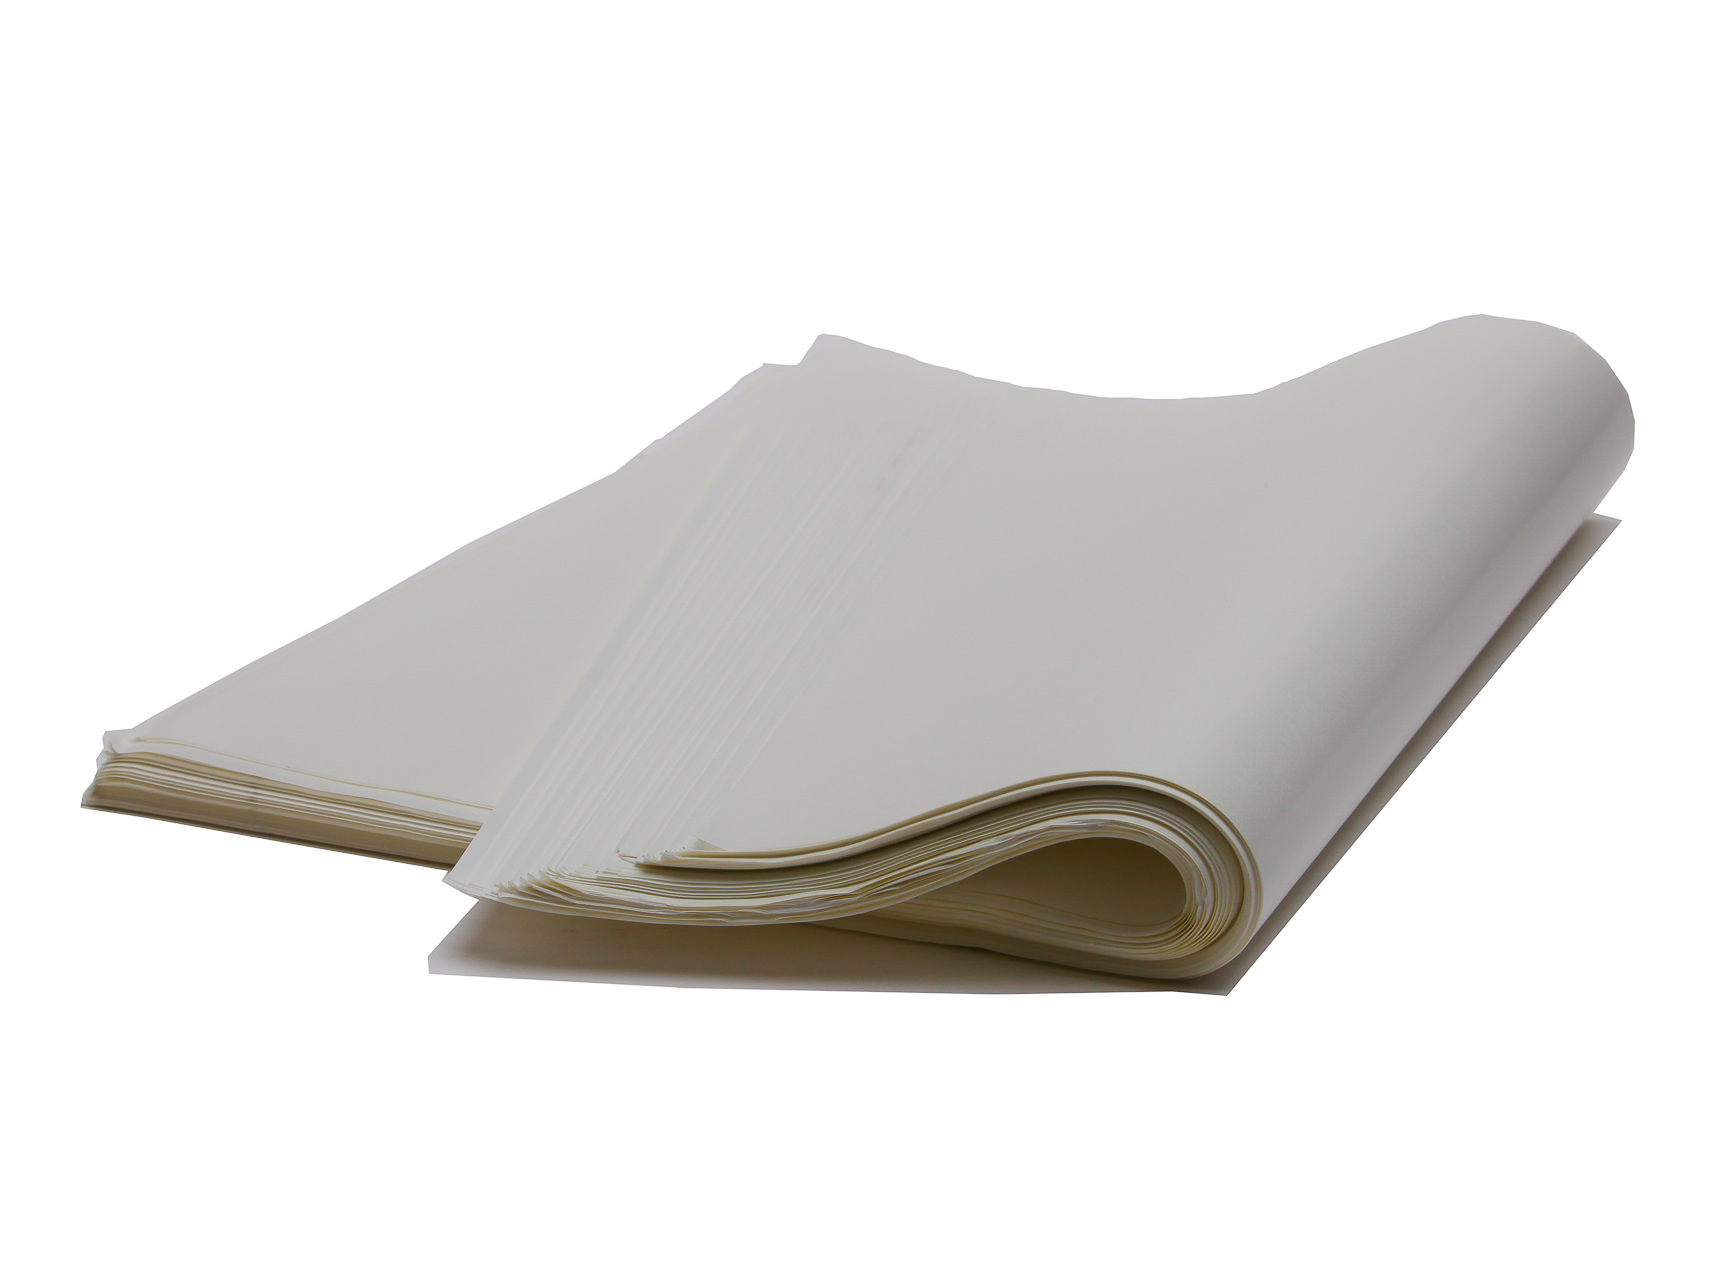 Frispack Frischpapier Einschlagpapier Metzger 12,5 kg Einschlagpapier f/ür Metzger 1//4 Bogen 37,5/×50 cm